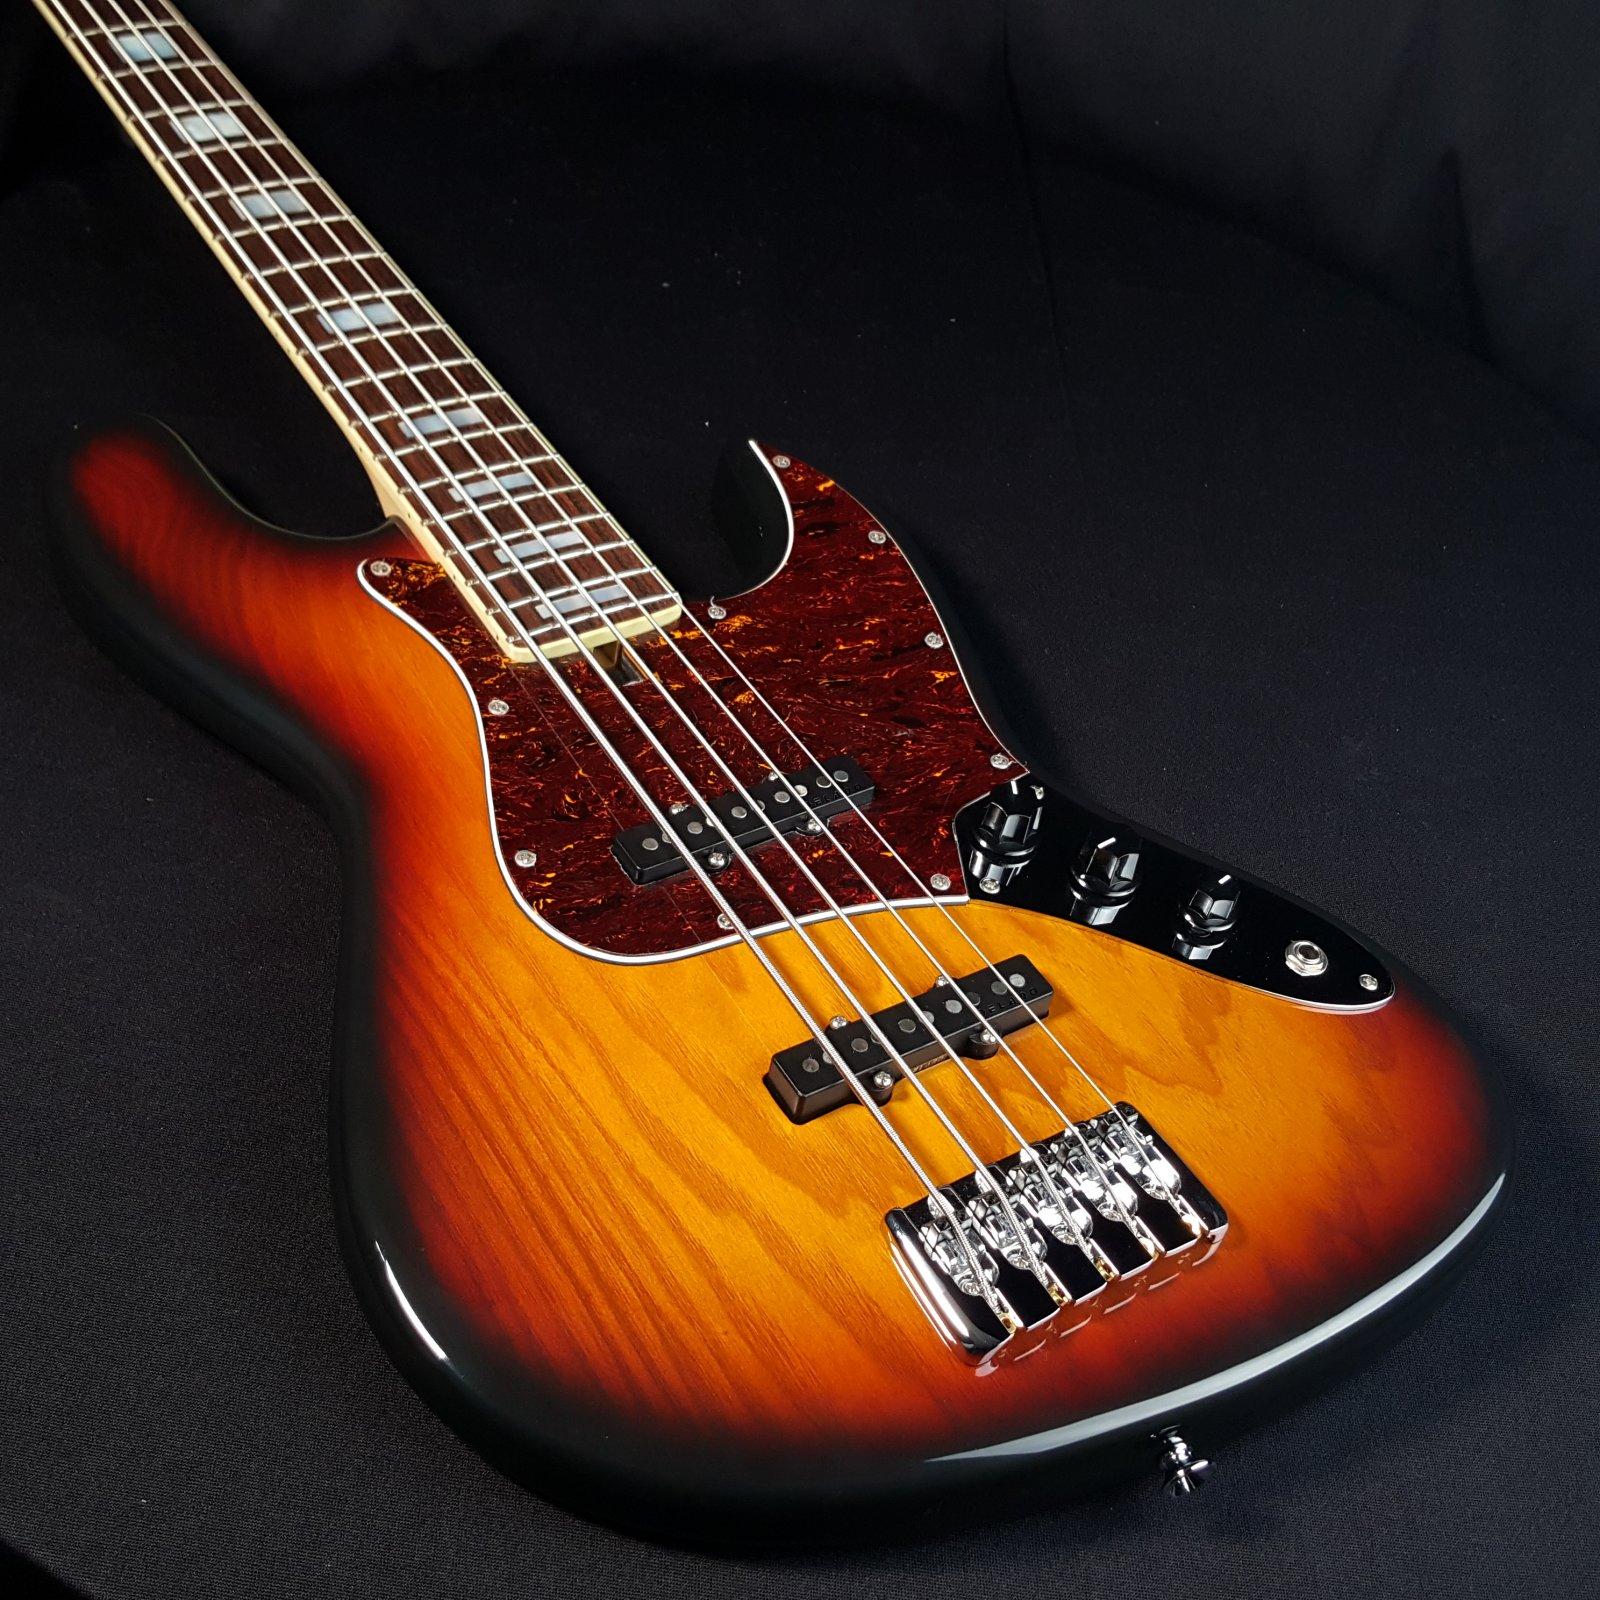 Maruszczyk Elwood 5p 5 String Bass 3 Tone Sunburst